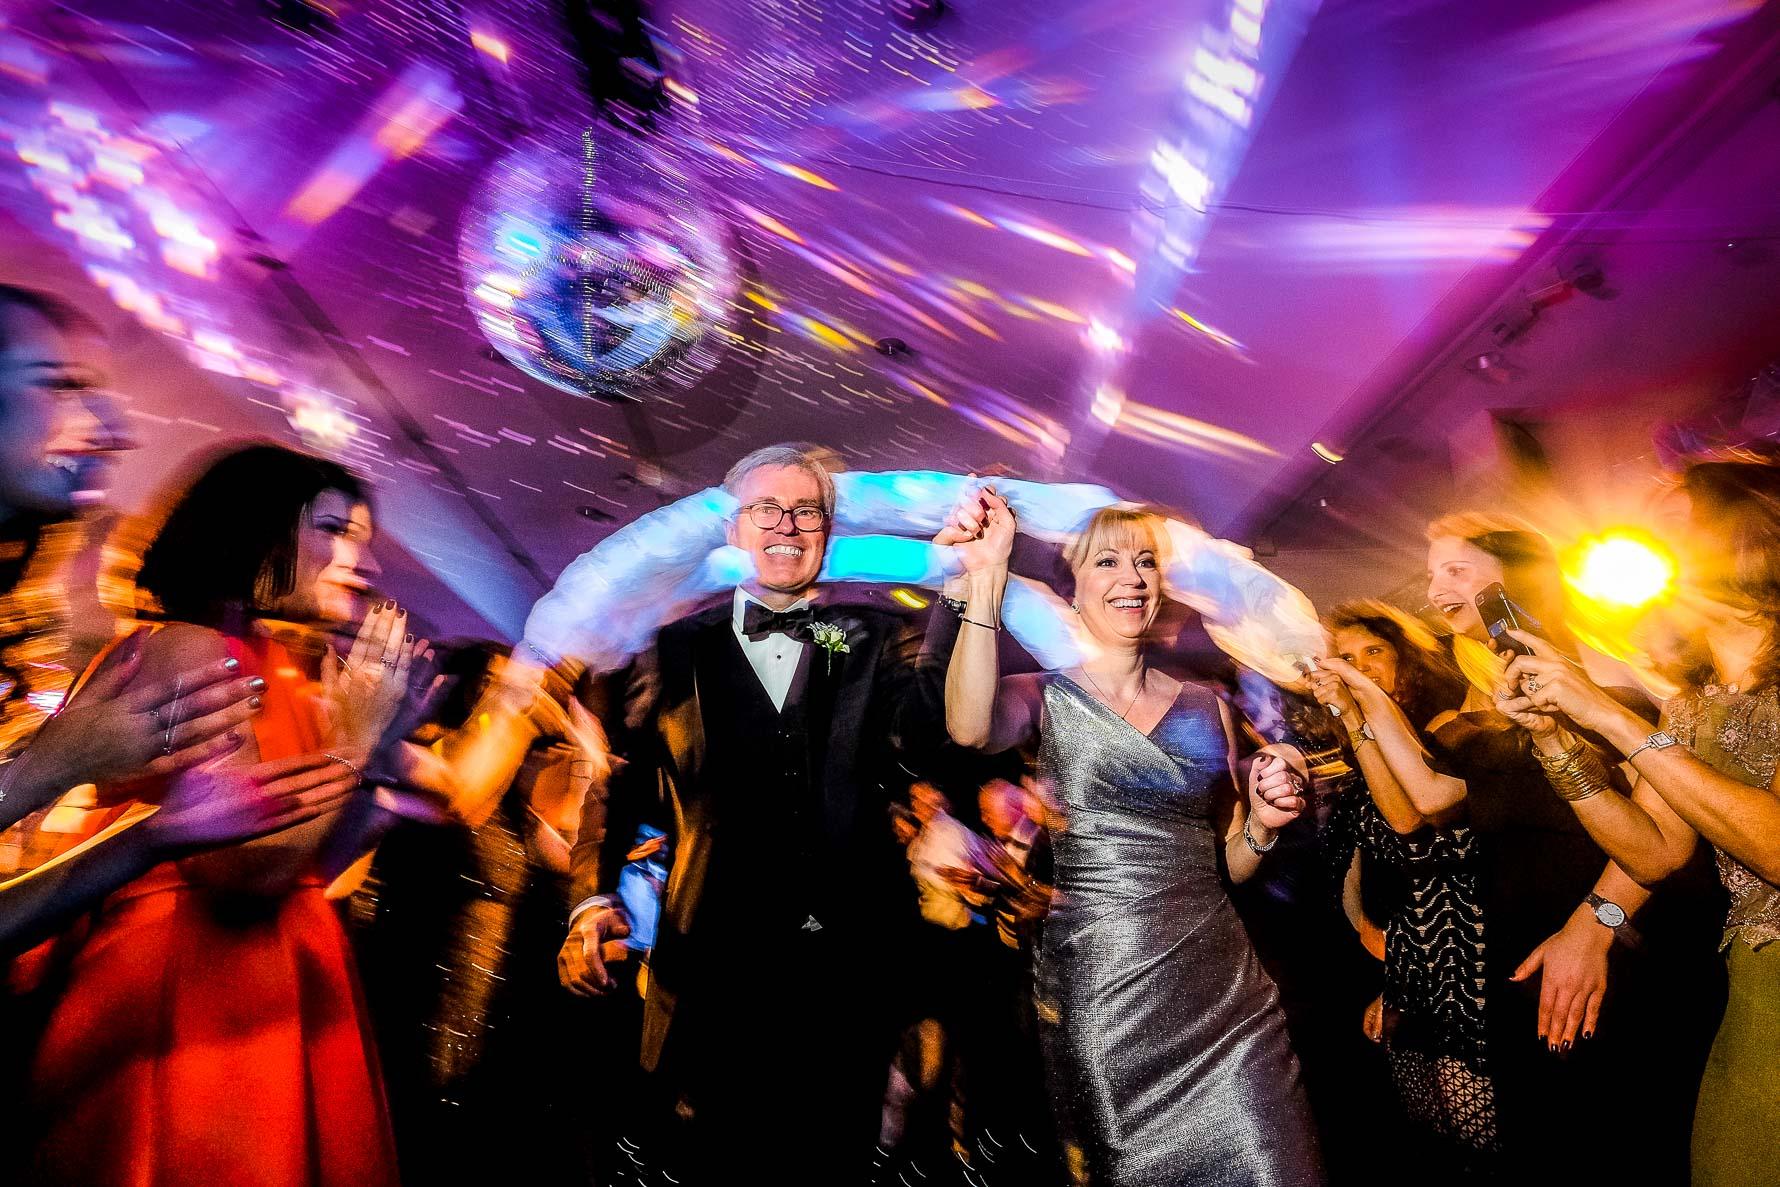 parents through guests dancing